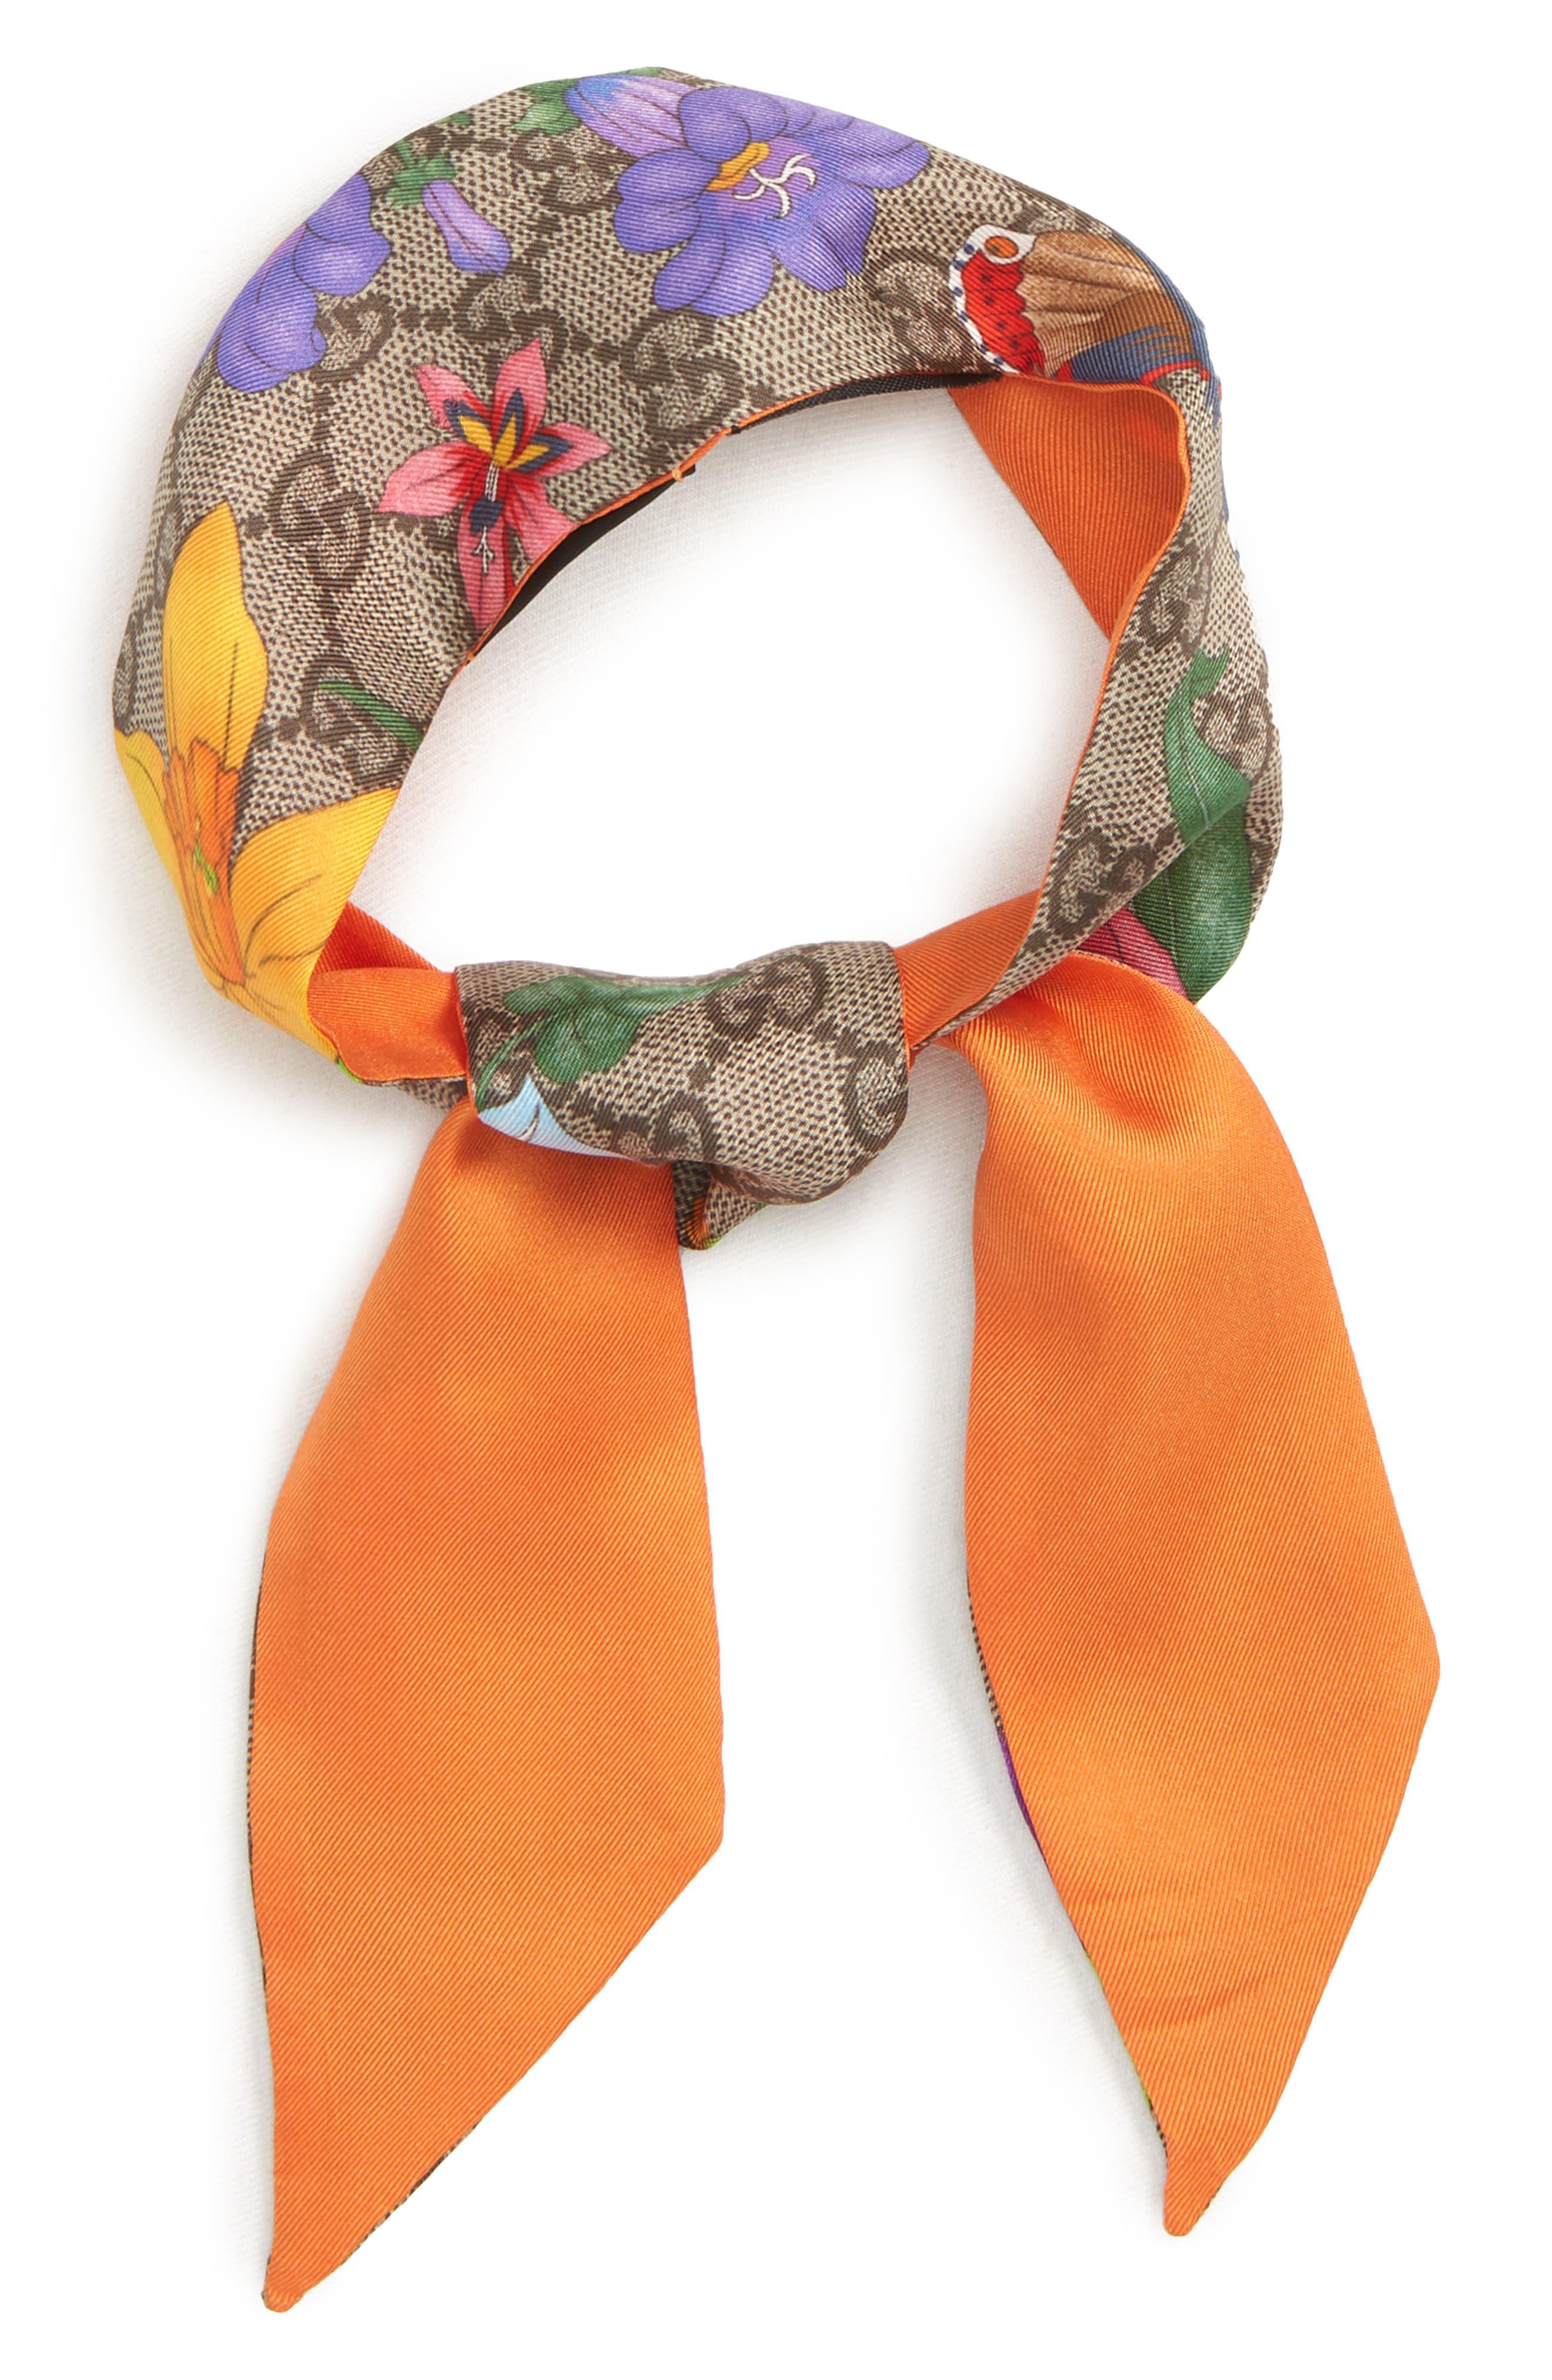 Flora Fluorescent Silk Neck Bow,                             Alternate thumbnail 2, color,                             ORANGE